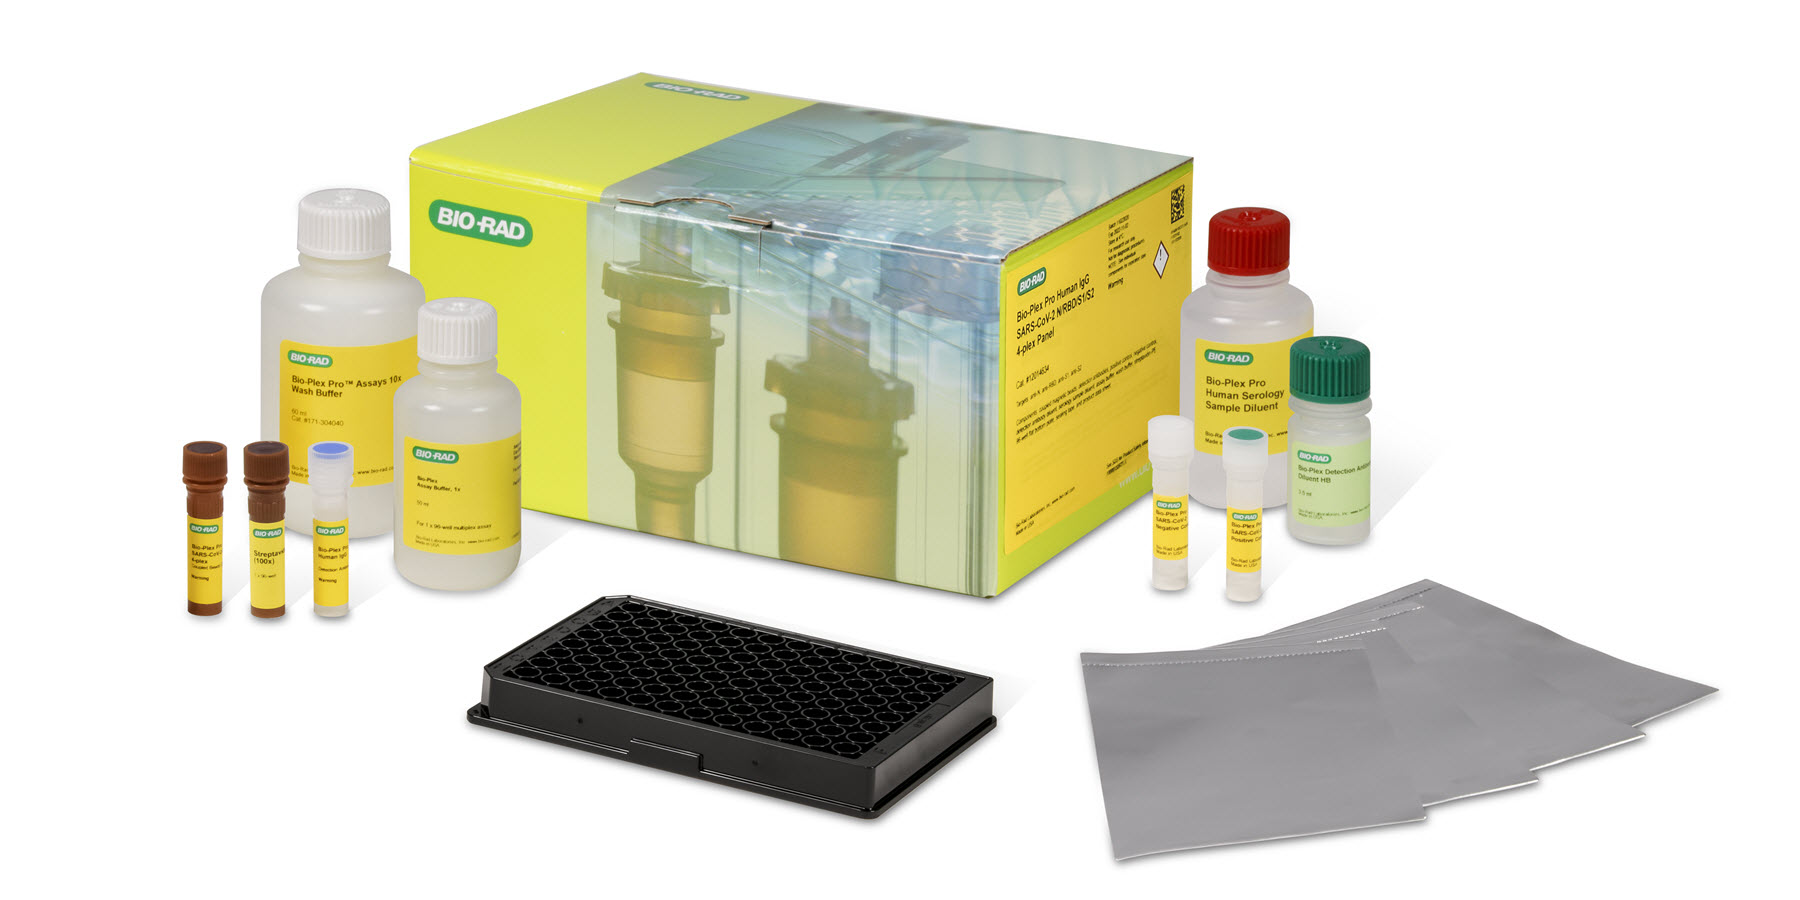 Bio-Rad Introduces Bio-Plex Pro Human IgG SARS-CoV-2 Serology Assays